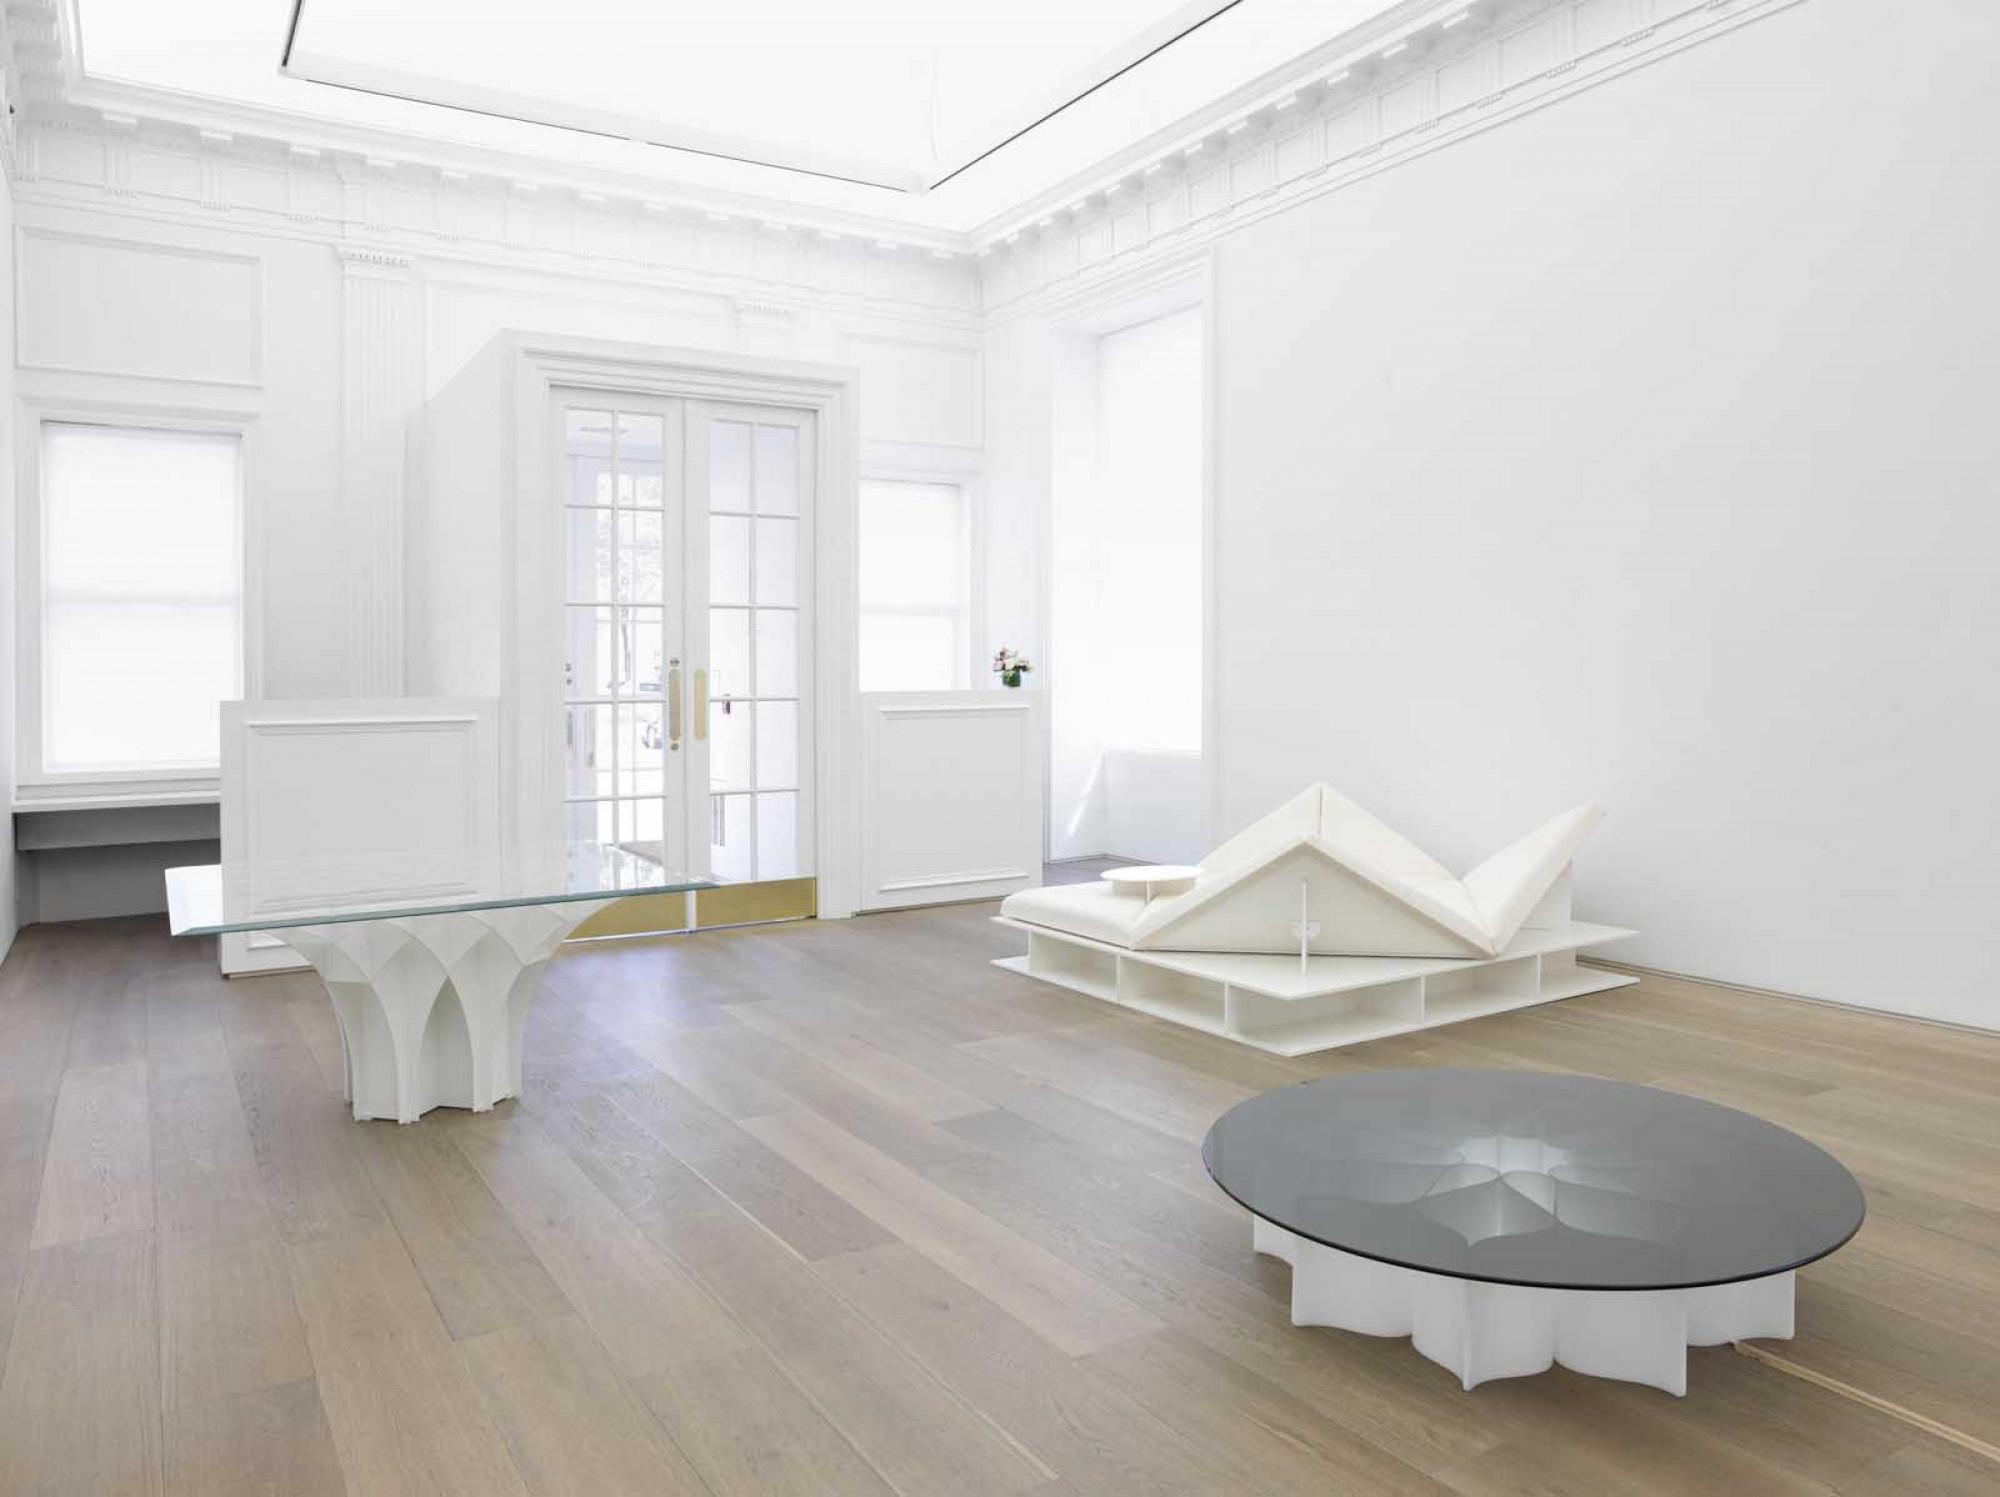 Pierre Paulin - Contemporary Art Exhibition intérieur Salon De Jardin En Pierre